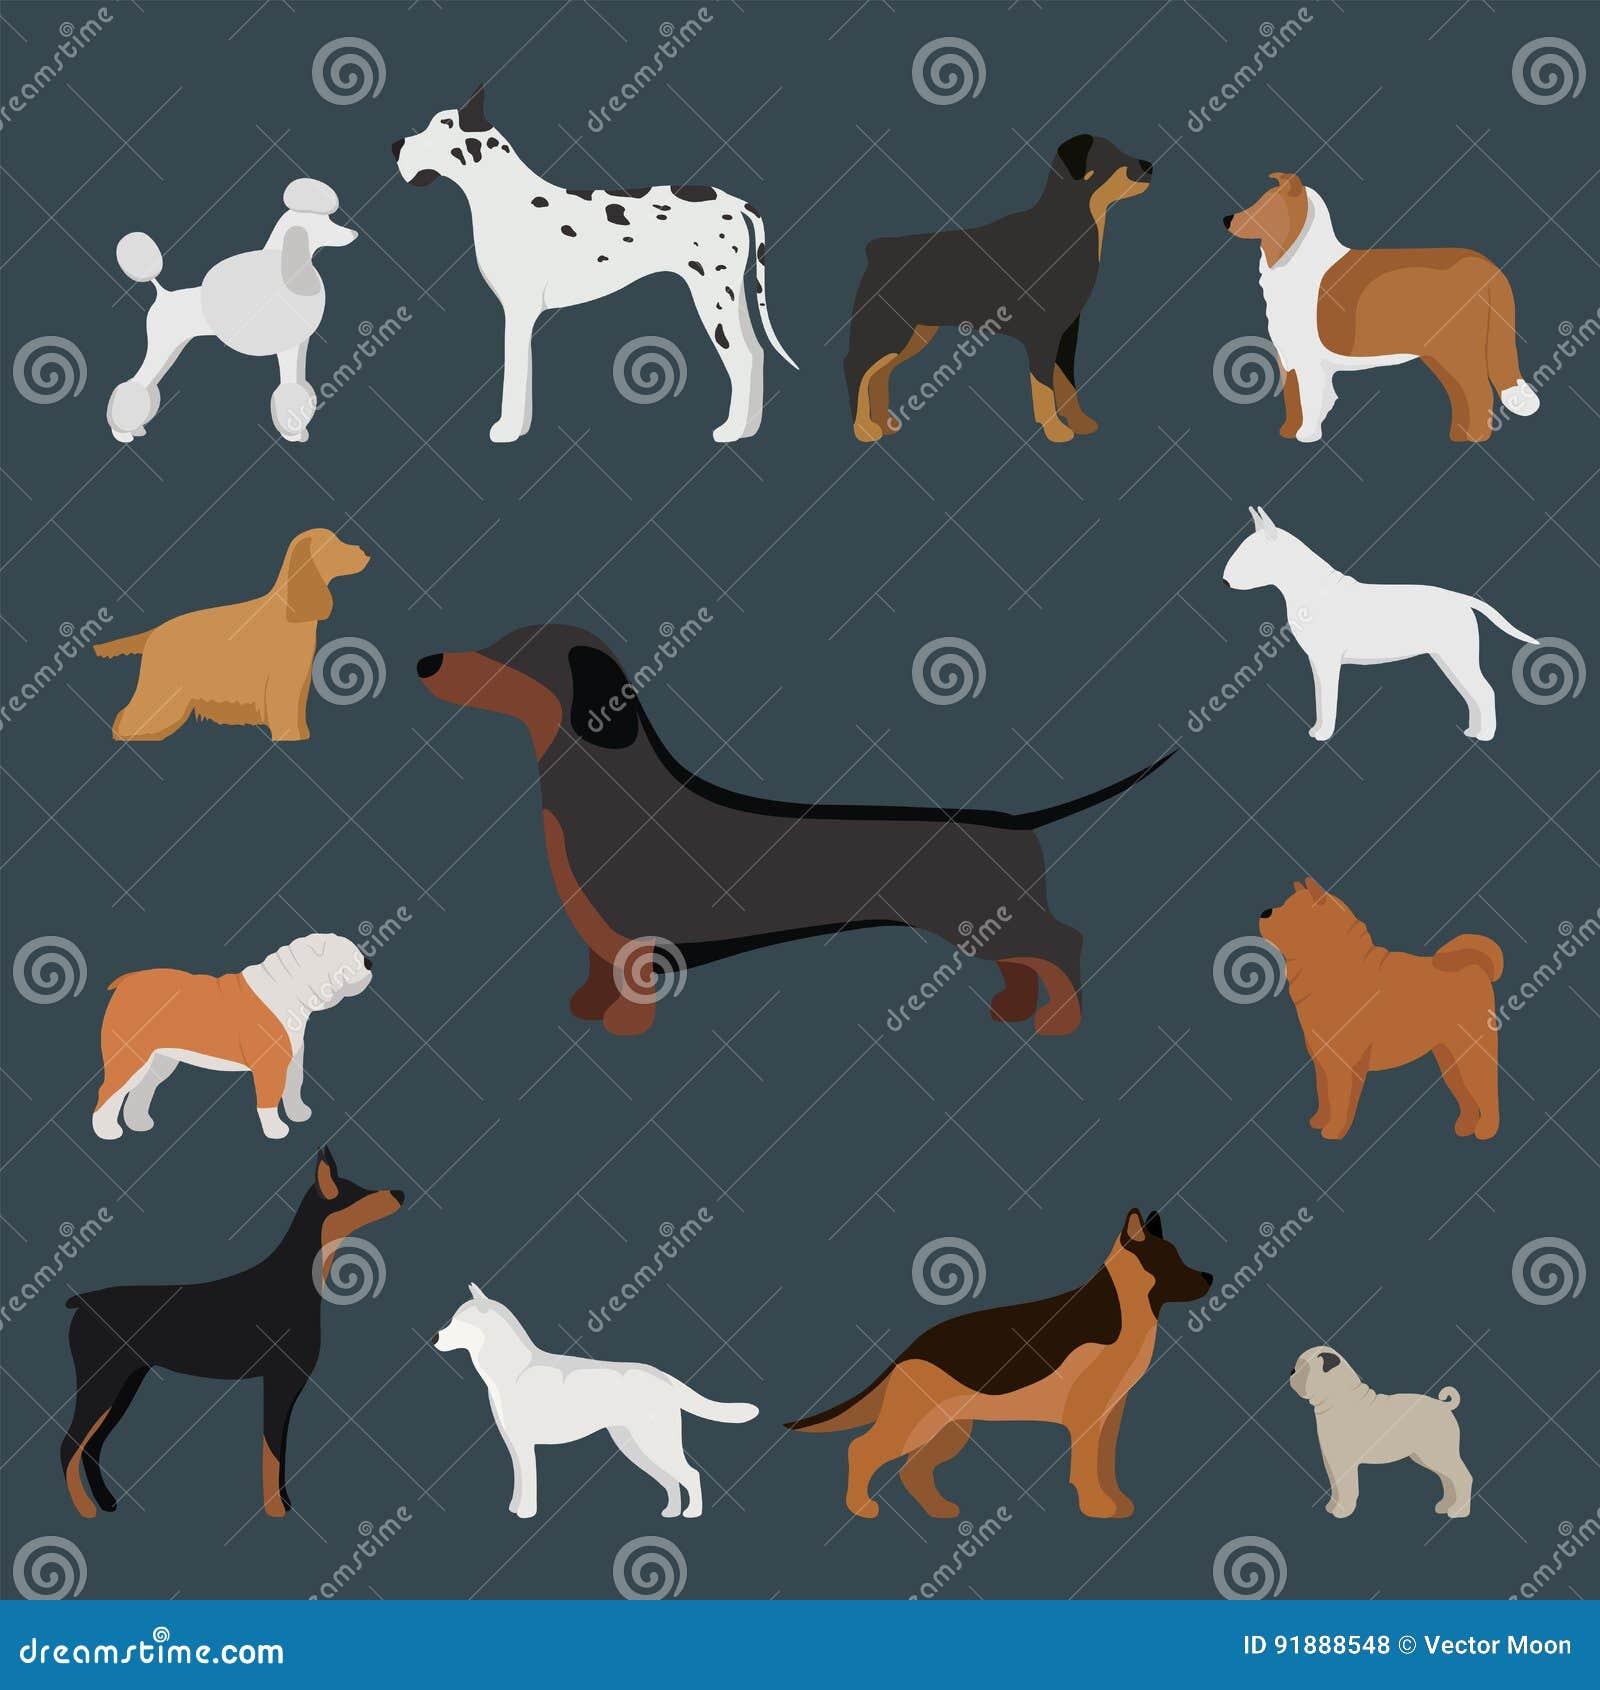 Funny cartoon dog character bread in cartoon style vector illustration.